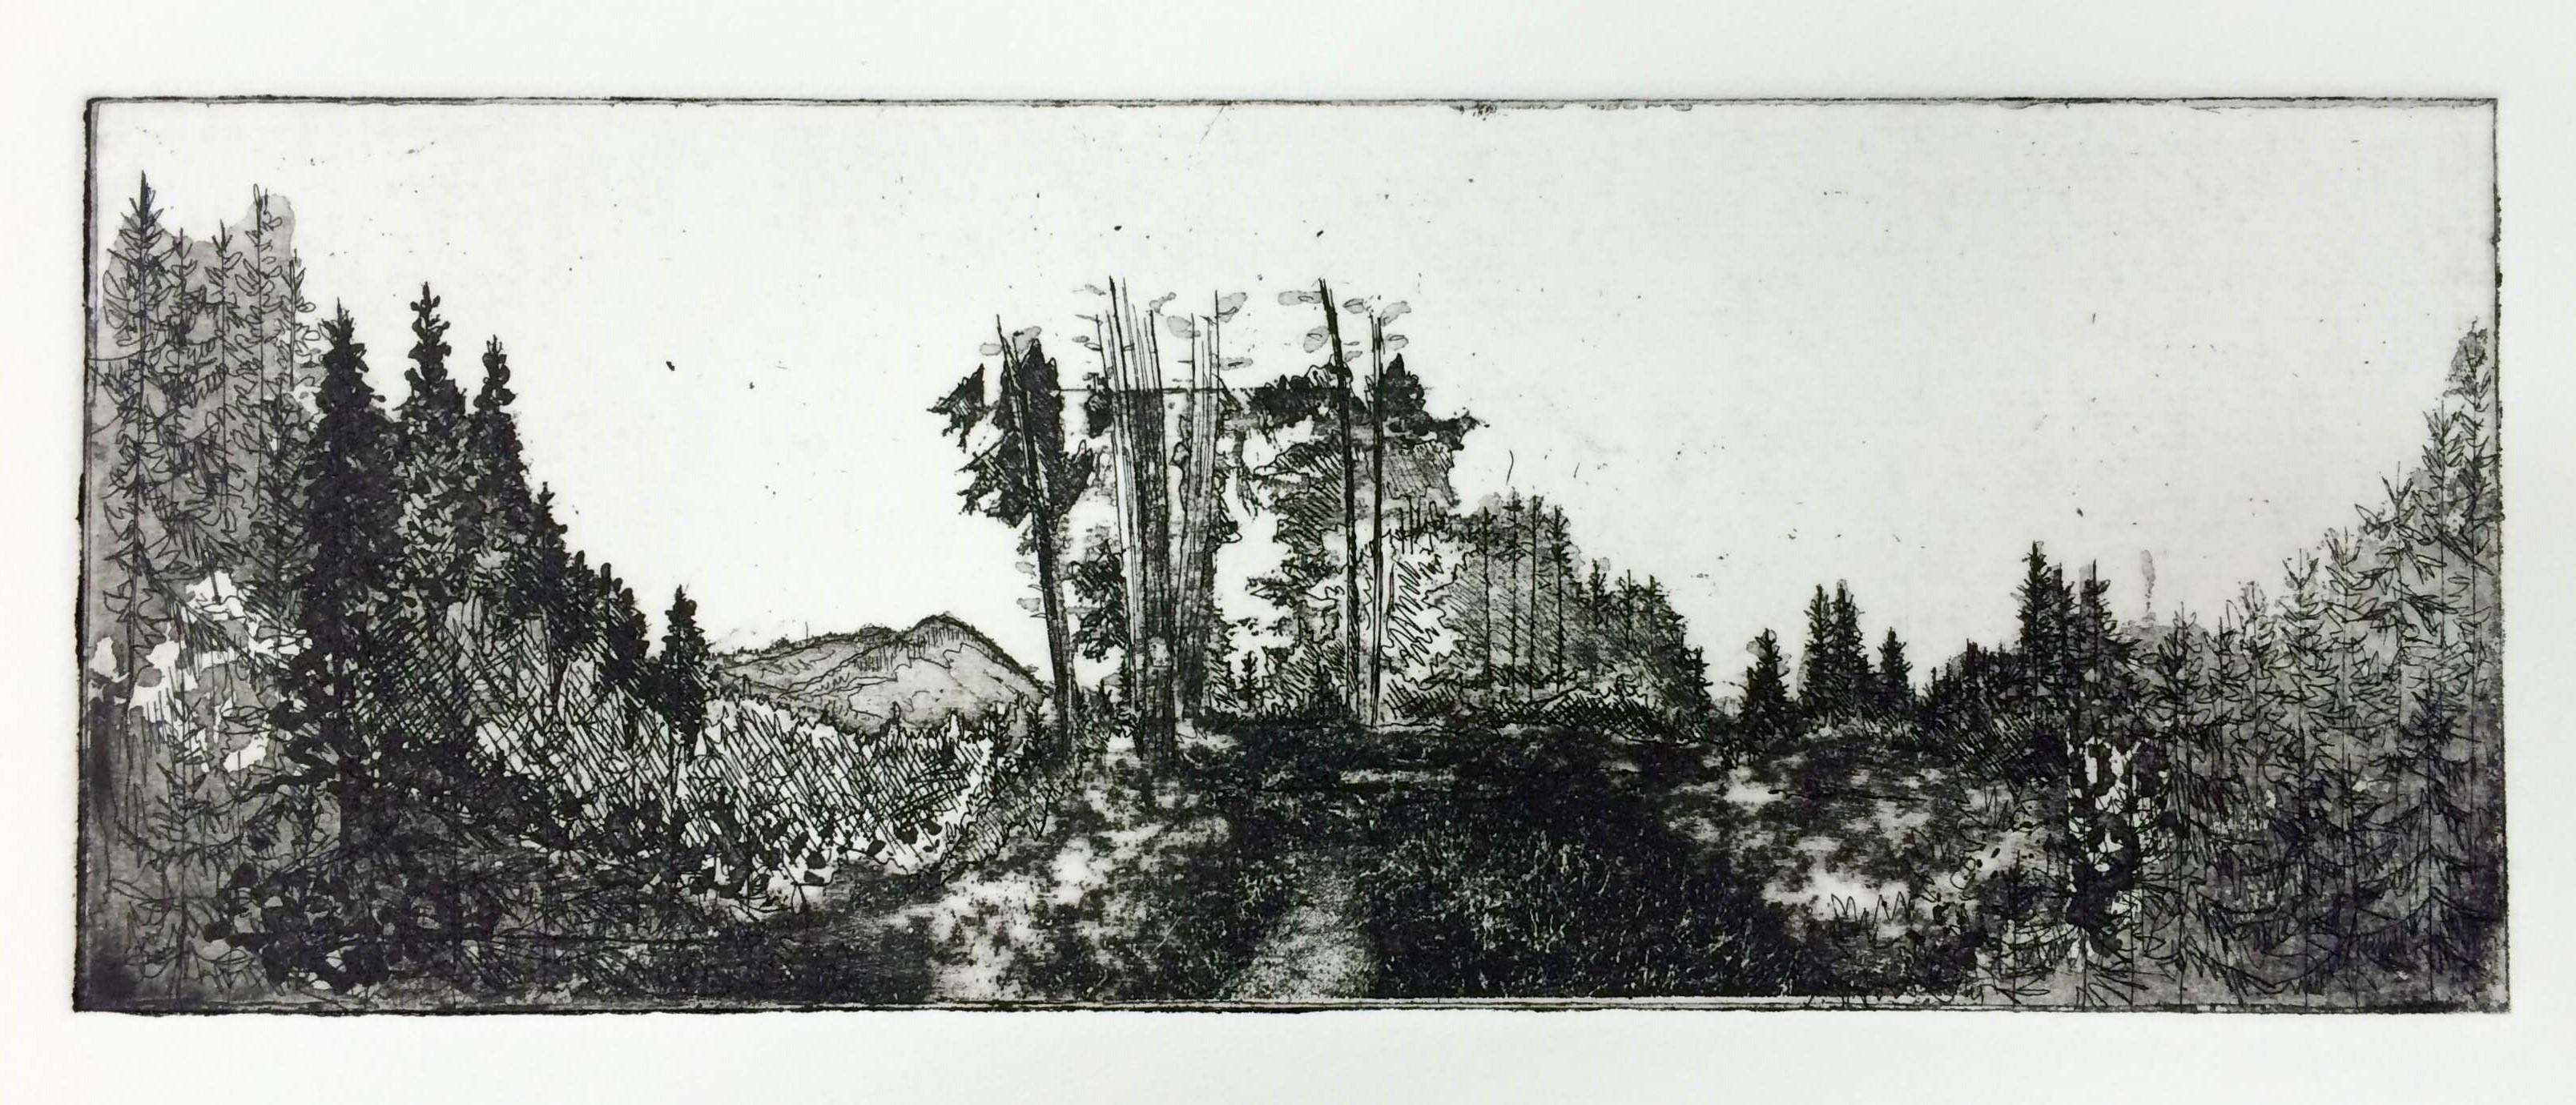 'Hemlock' Hardground, aquatint, sugar lift and photo etching. Image size 20.2x7.5cm